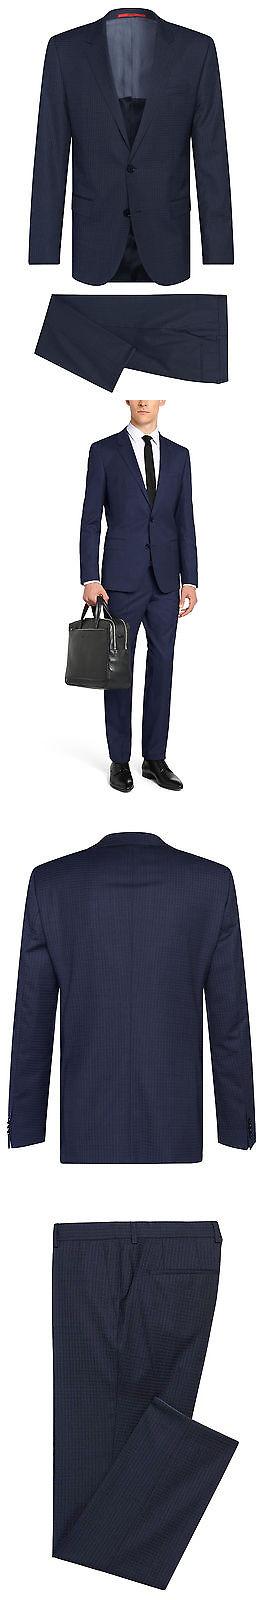 9c3f82c6458 Suits 3001  Hugo Boss Slim Fit Checked Wool 2 Piece Men S Suit C-Huge C-Genius-50326169  Blue -  BUY IT NOW ONLY   382.25 on eBay!